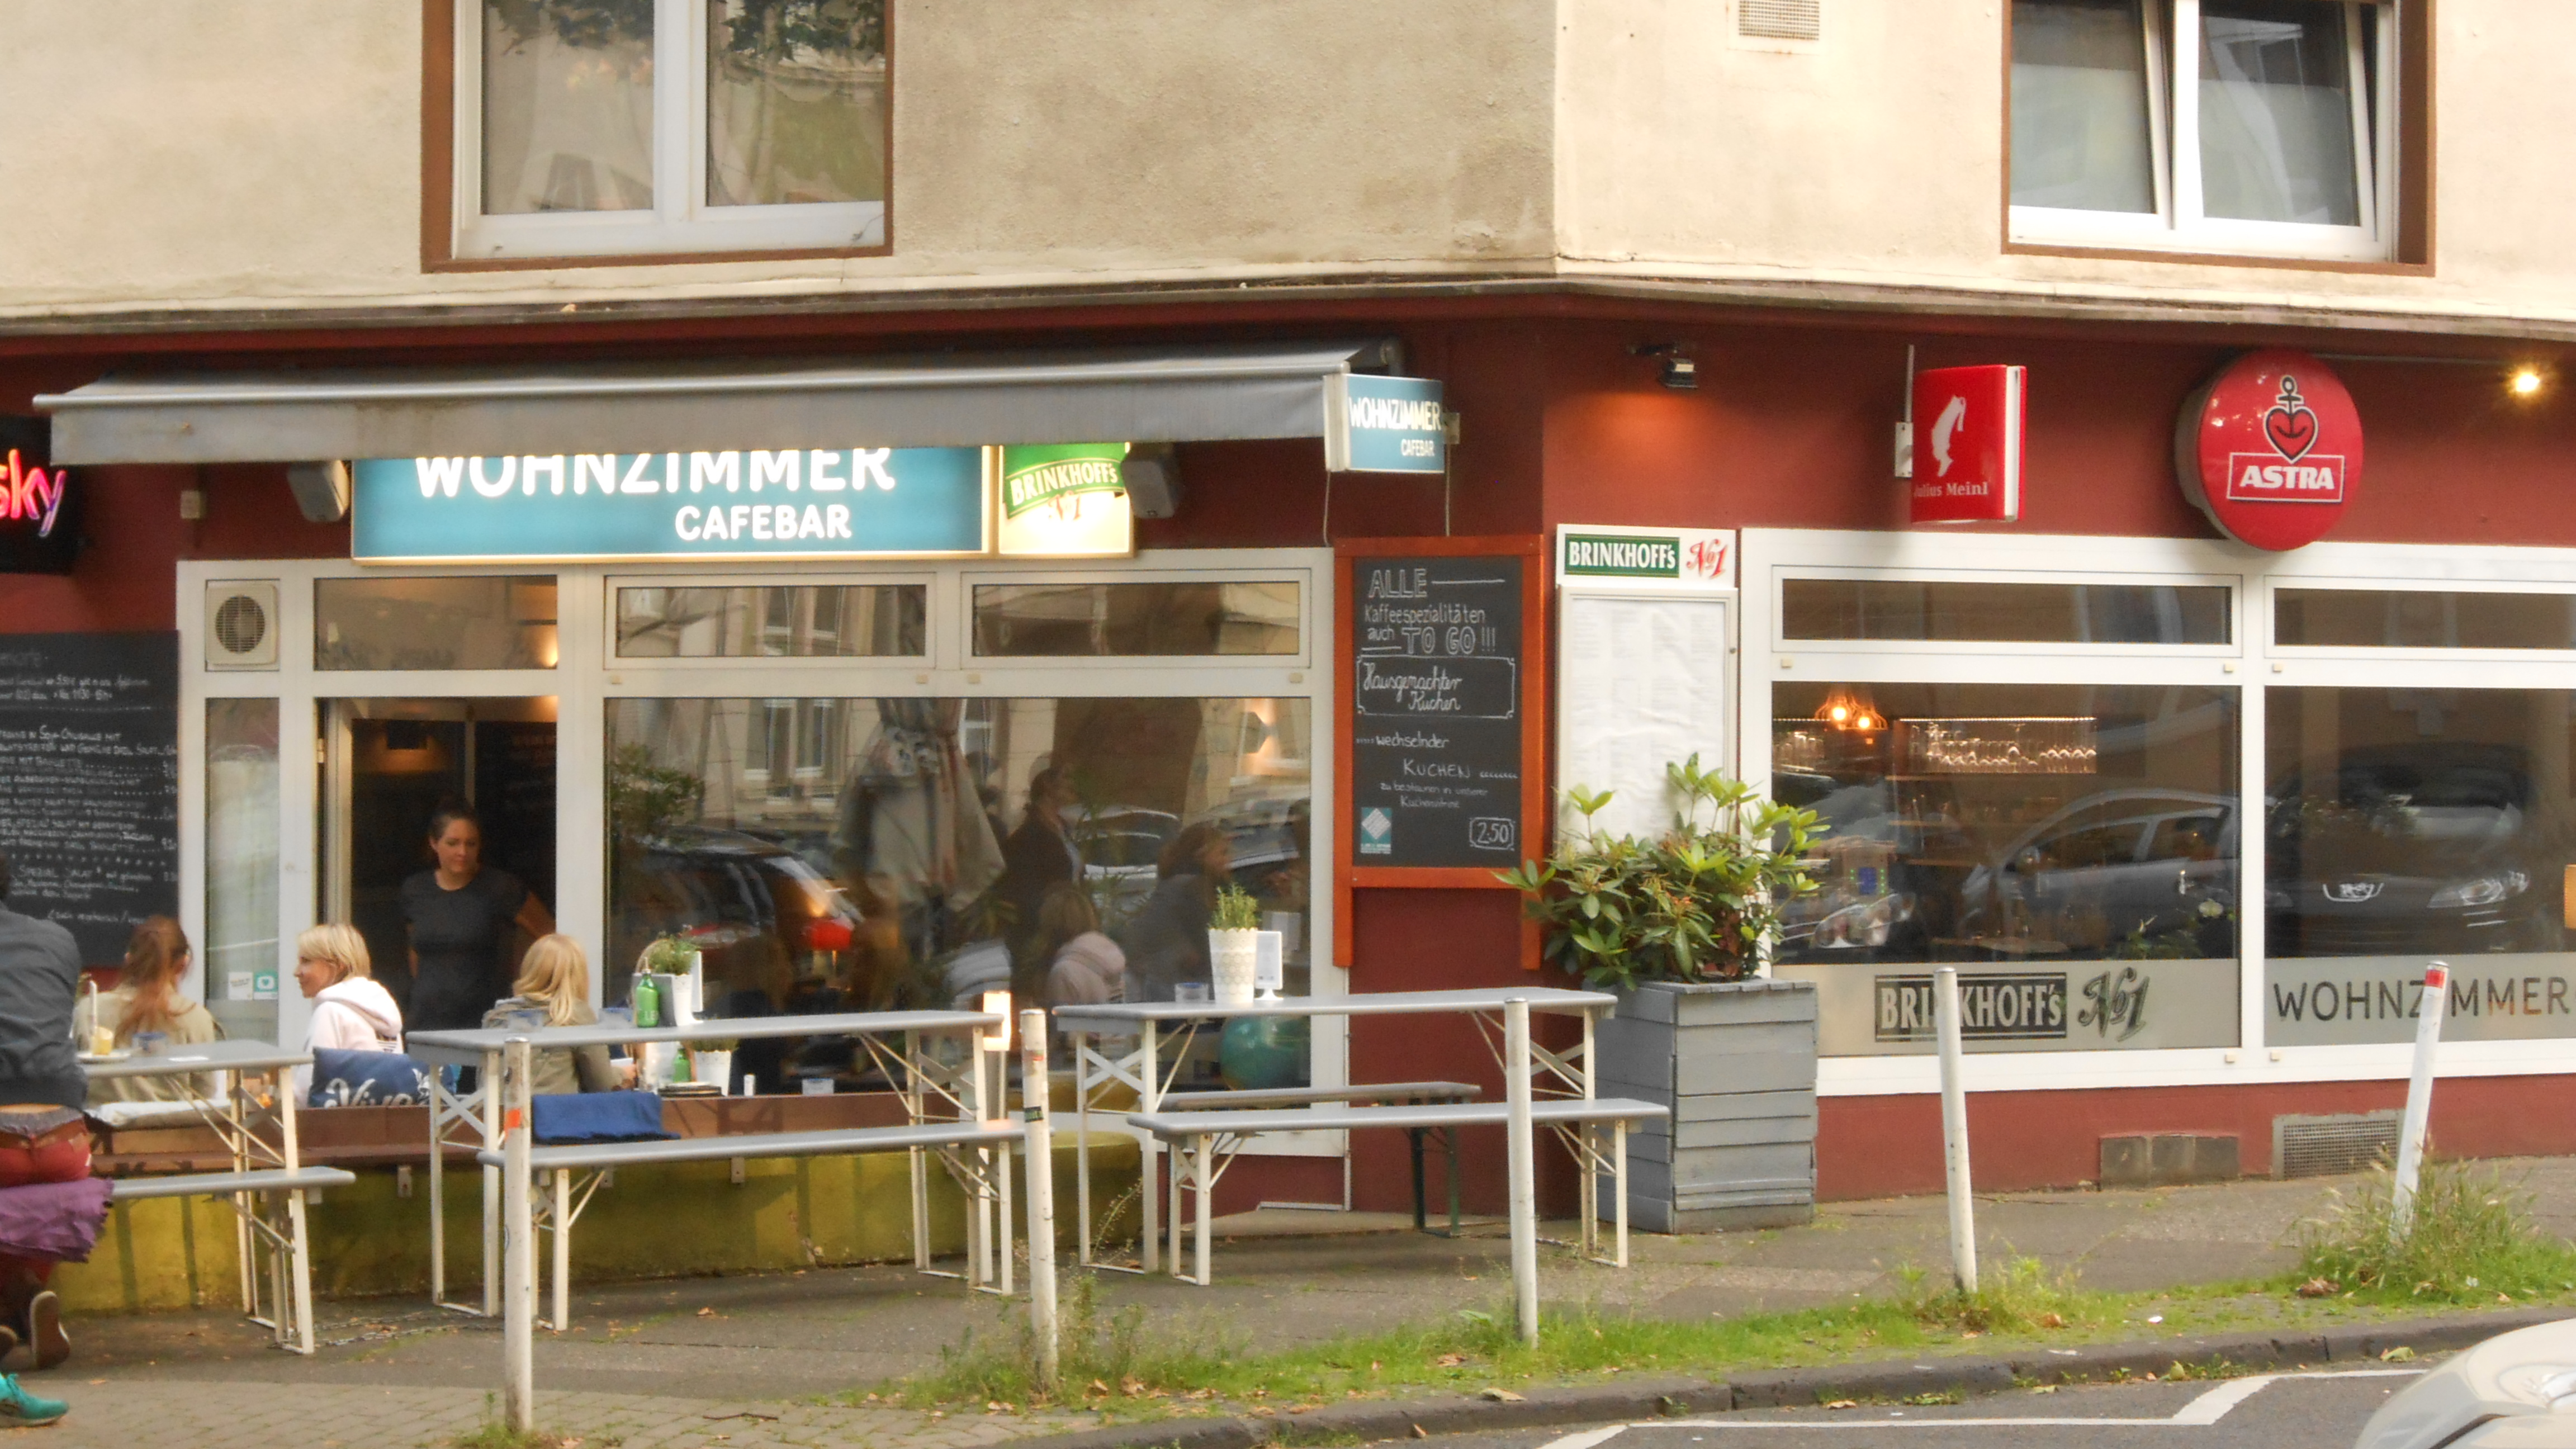 File:Wohnzimmer CaféBar, Dortmund (1).   Wikimedia Commons